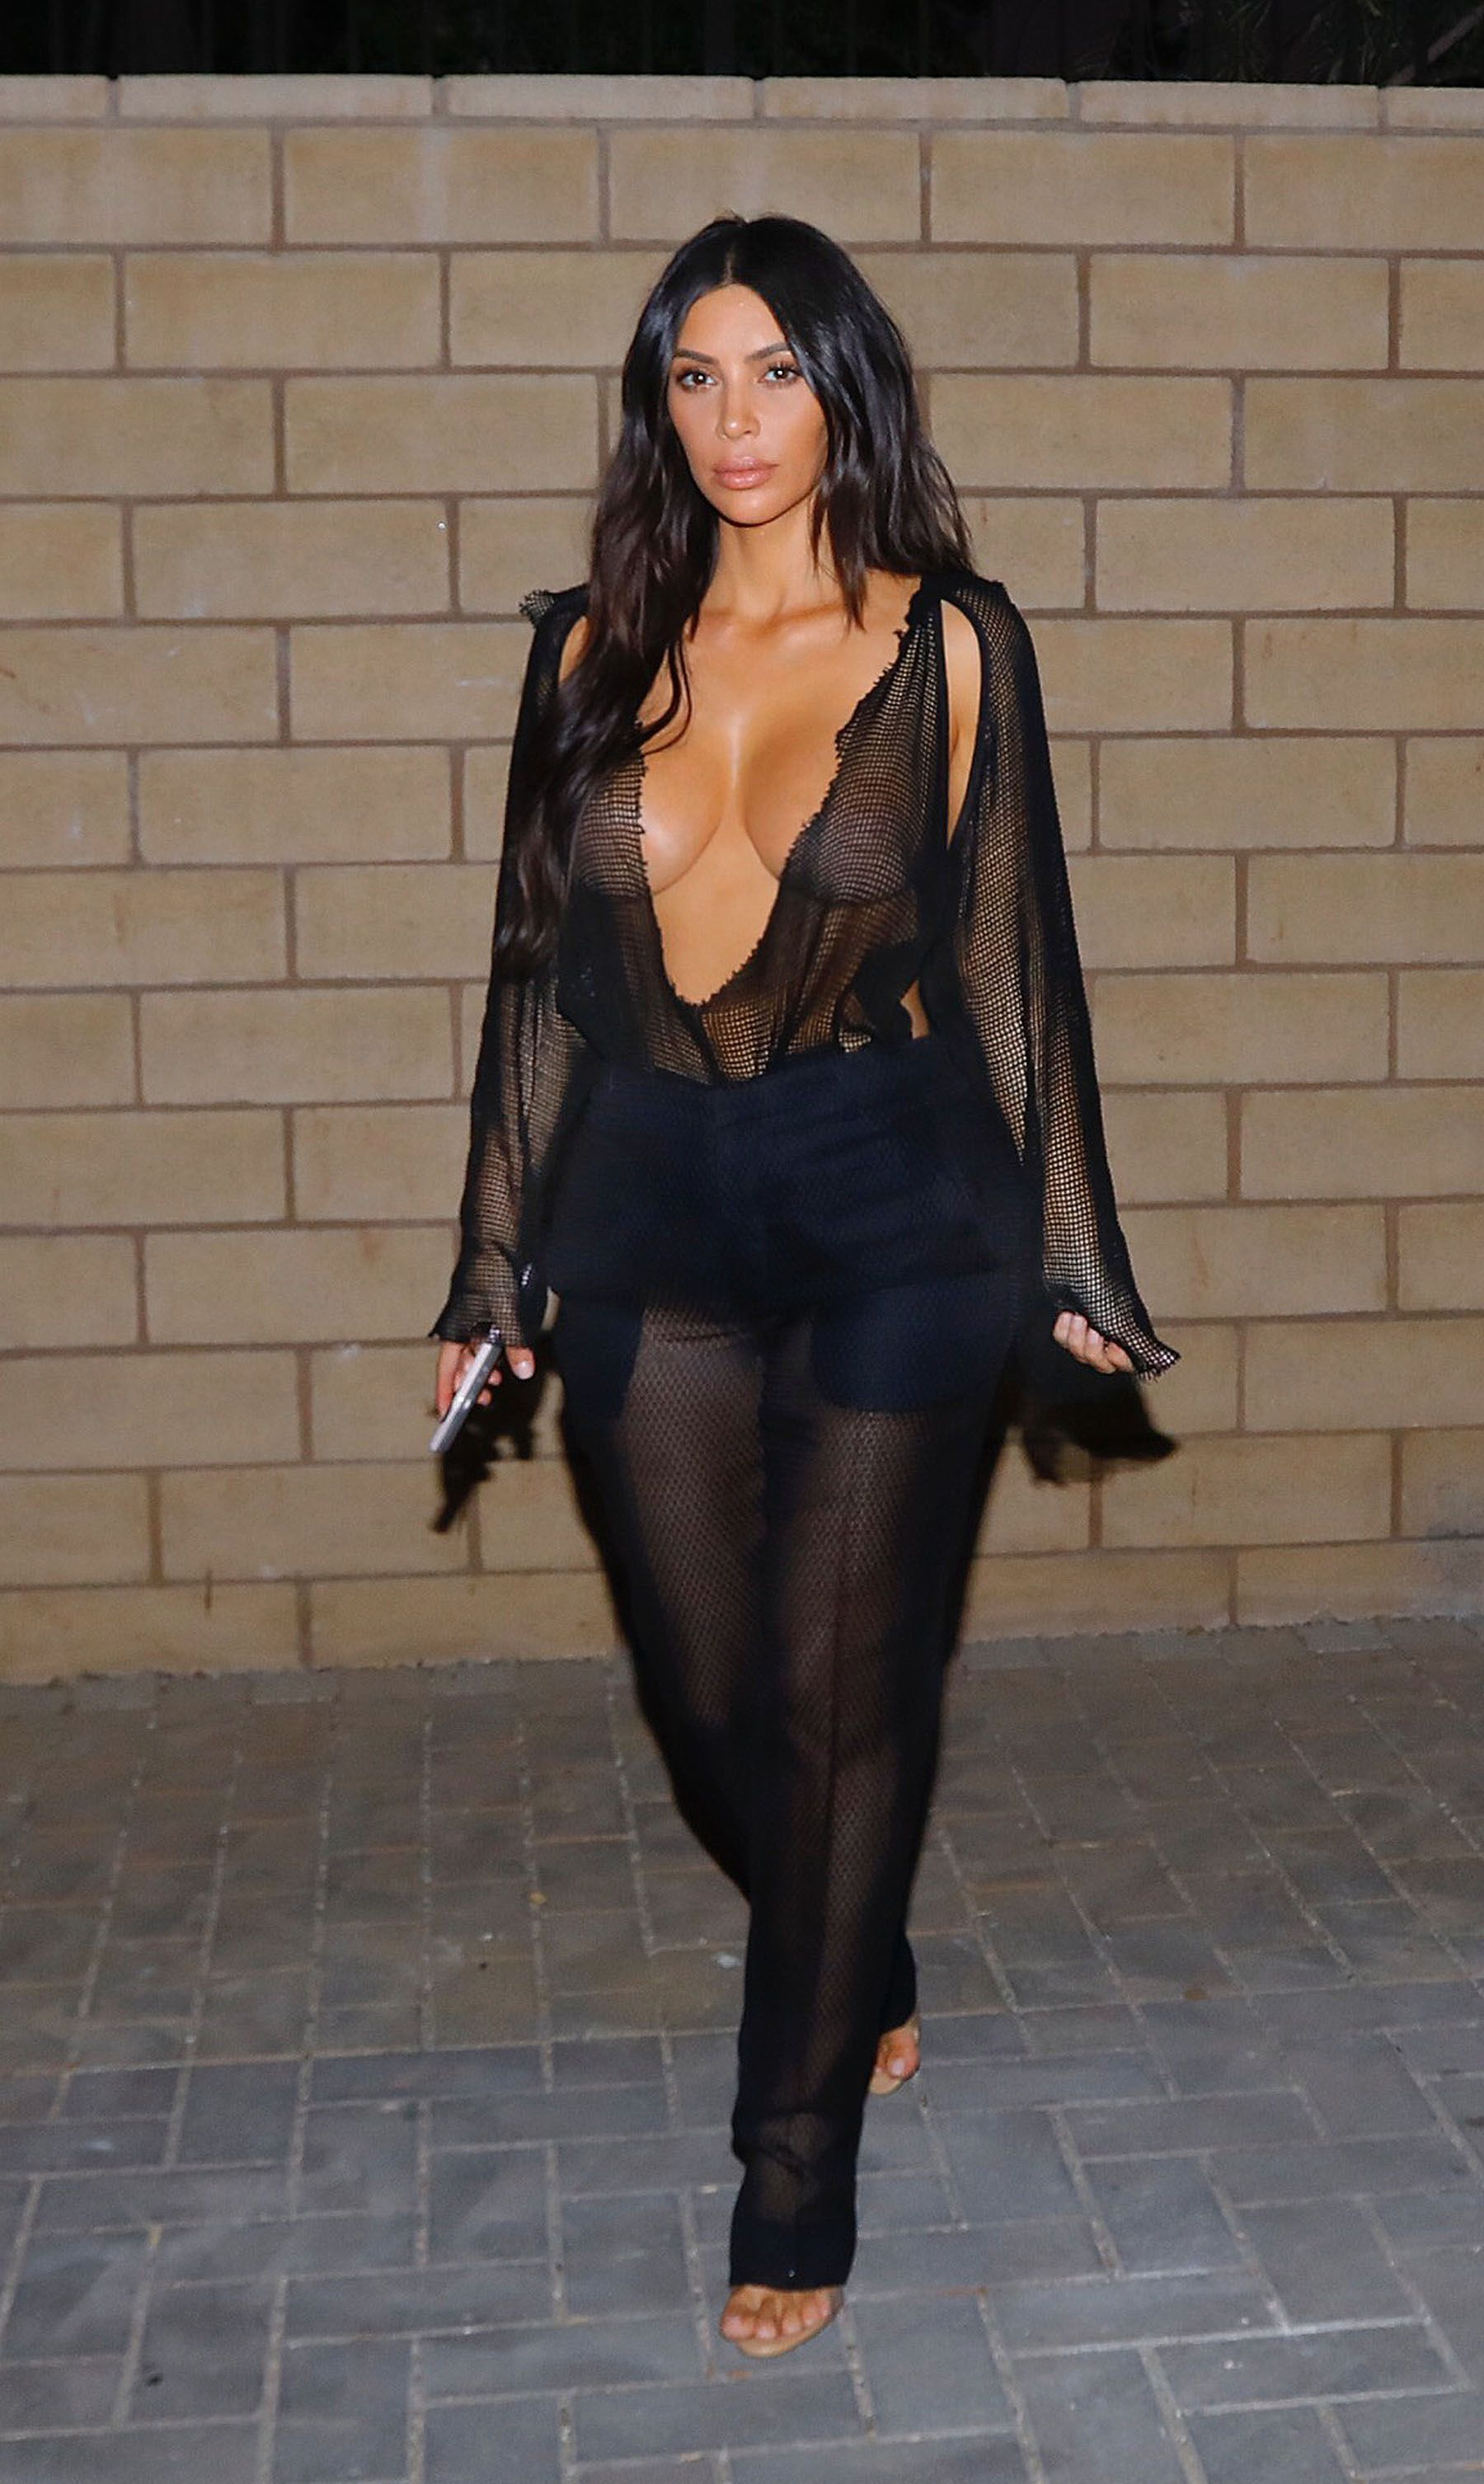 Kim Kardashian Wears Black Fishnet Jumpsuit Kim Goes Braless In